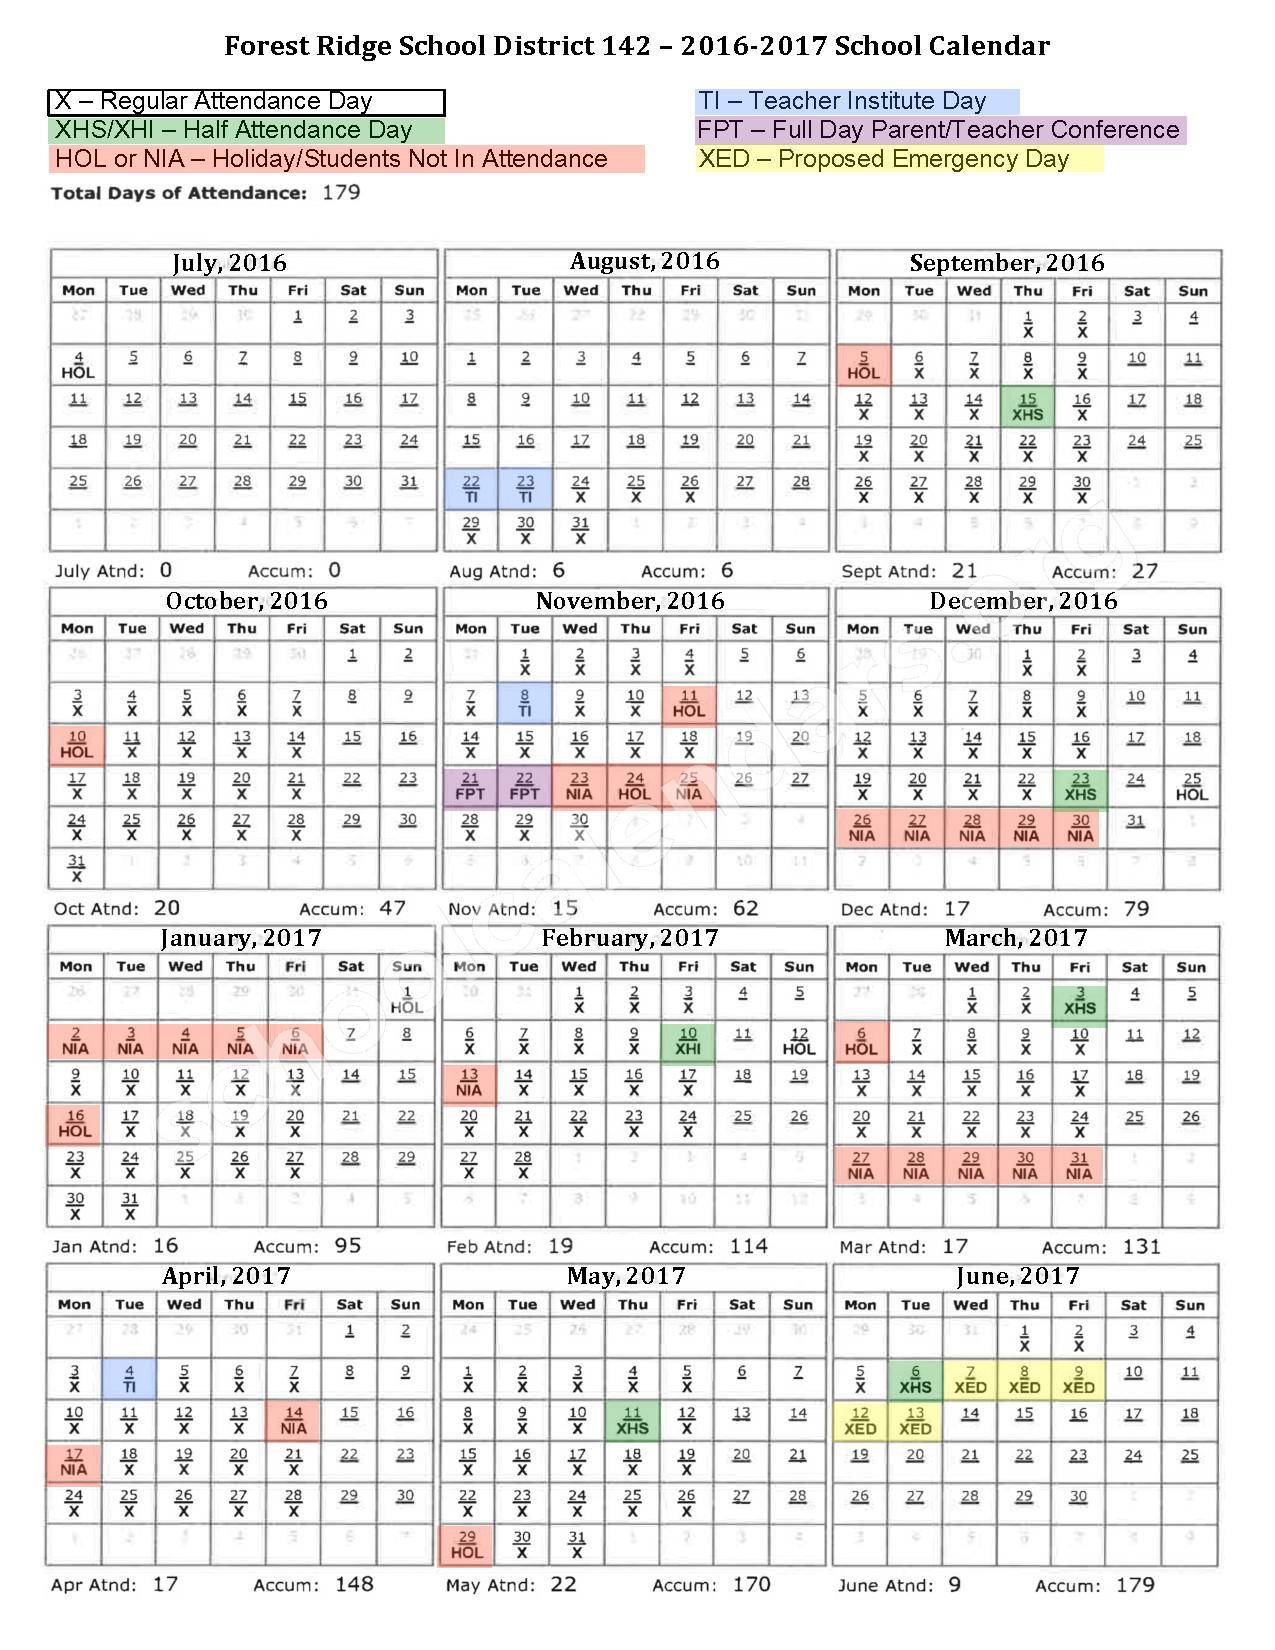 2016 - 2017 School Calendar – Lee R Foster Elementary School – page 1